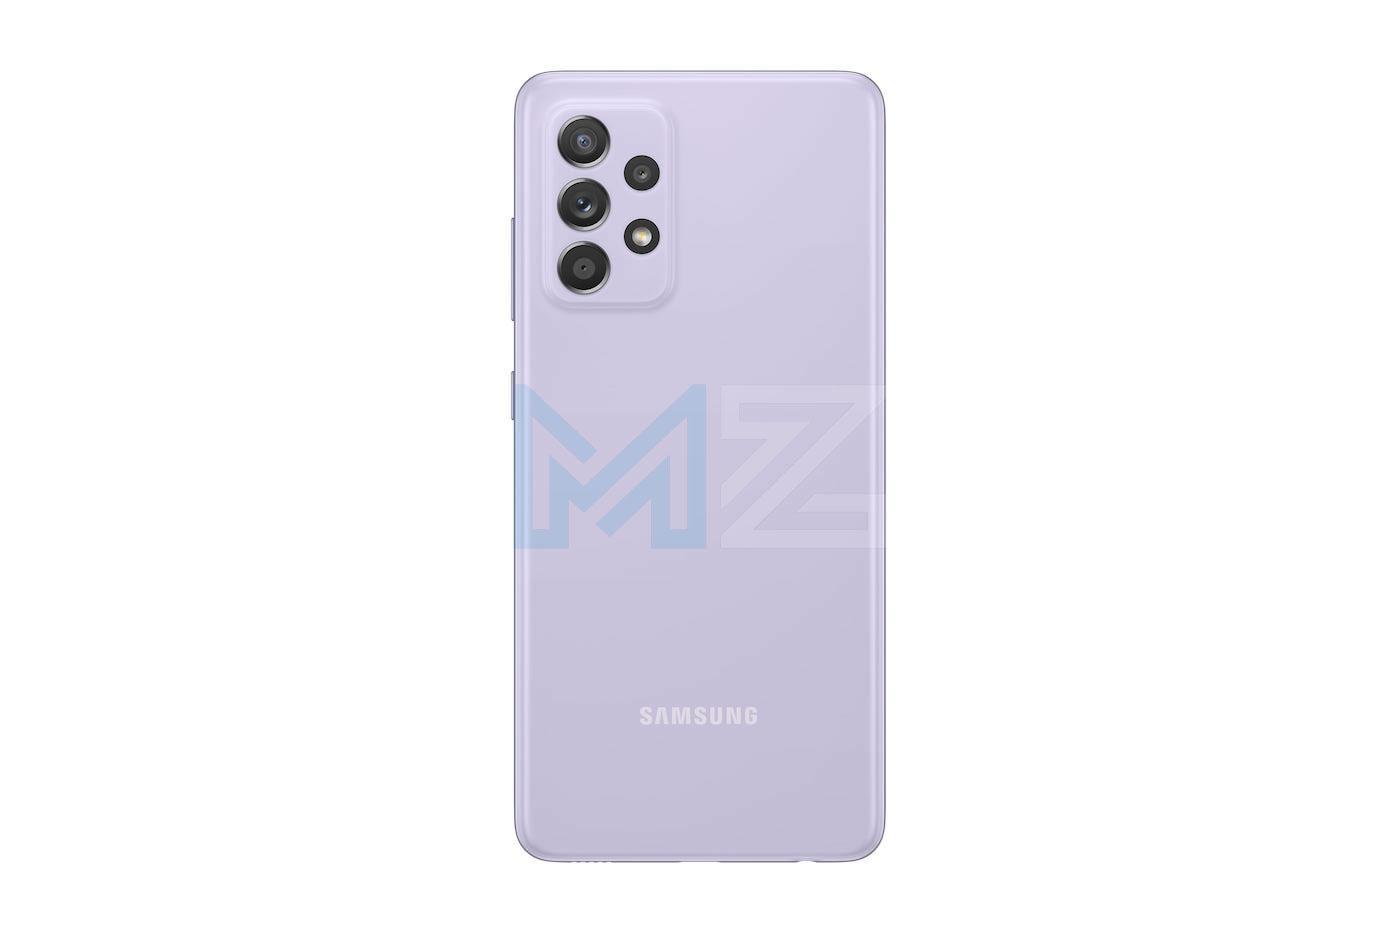 Samsung Galaxy A52s violeta